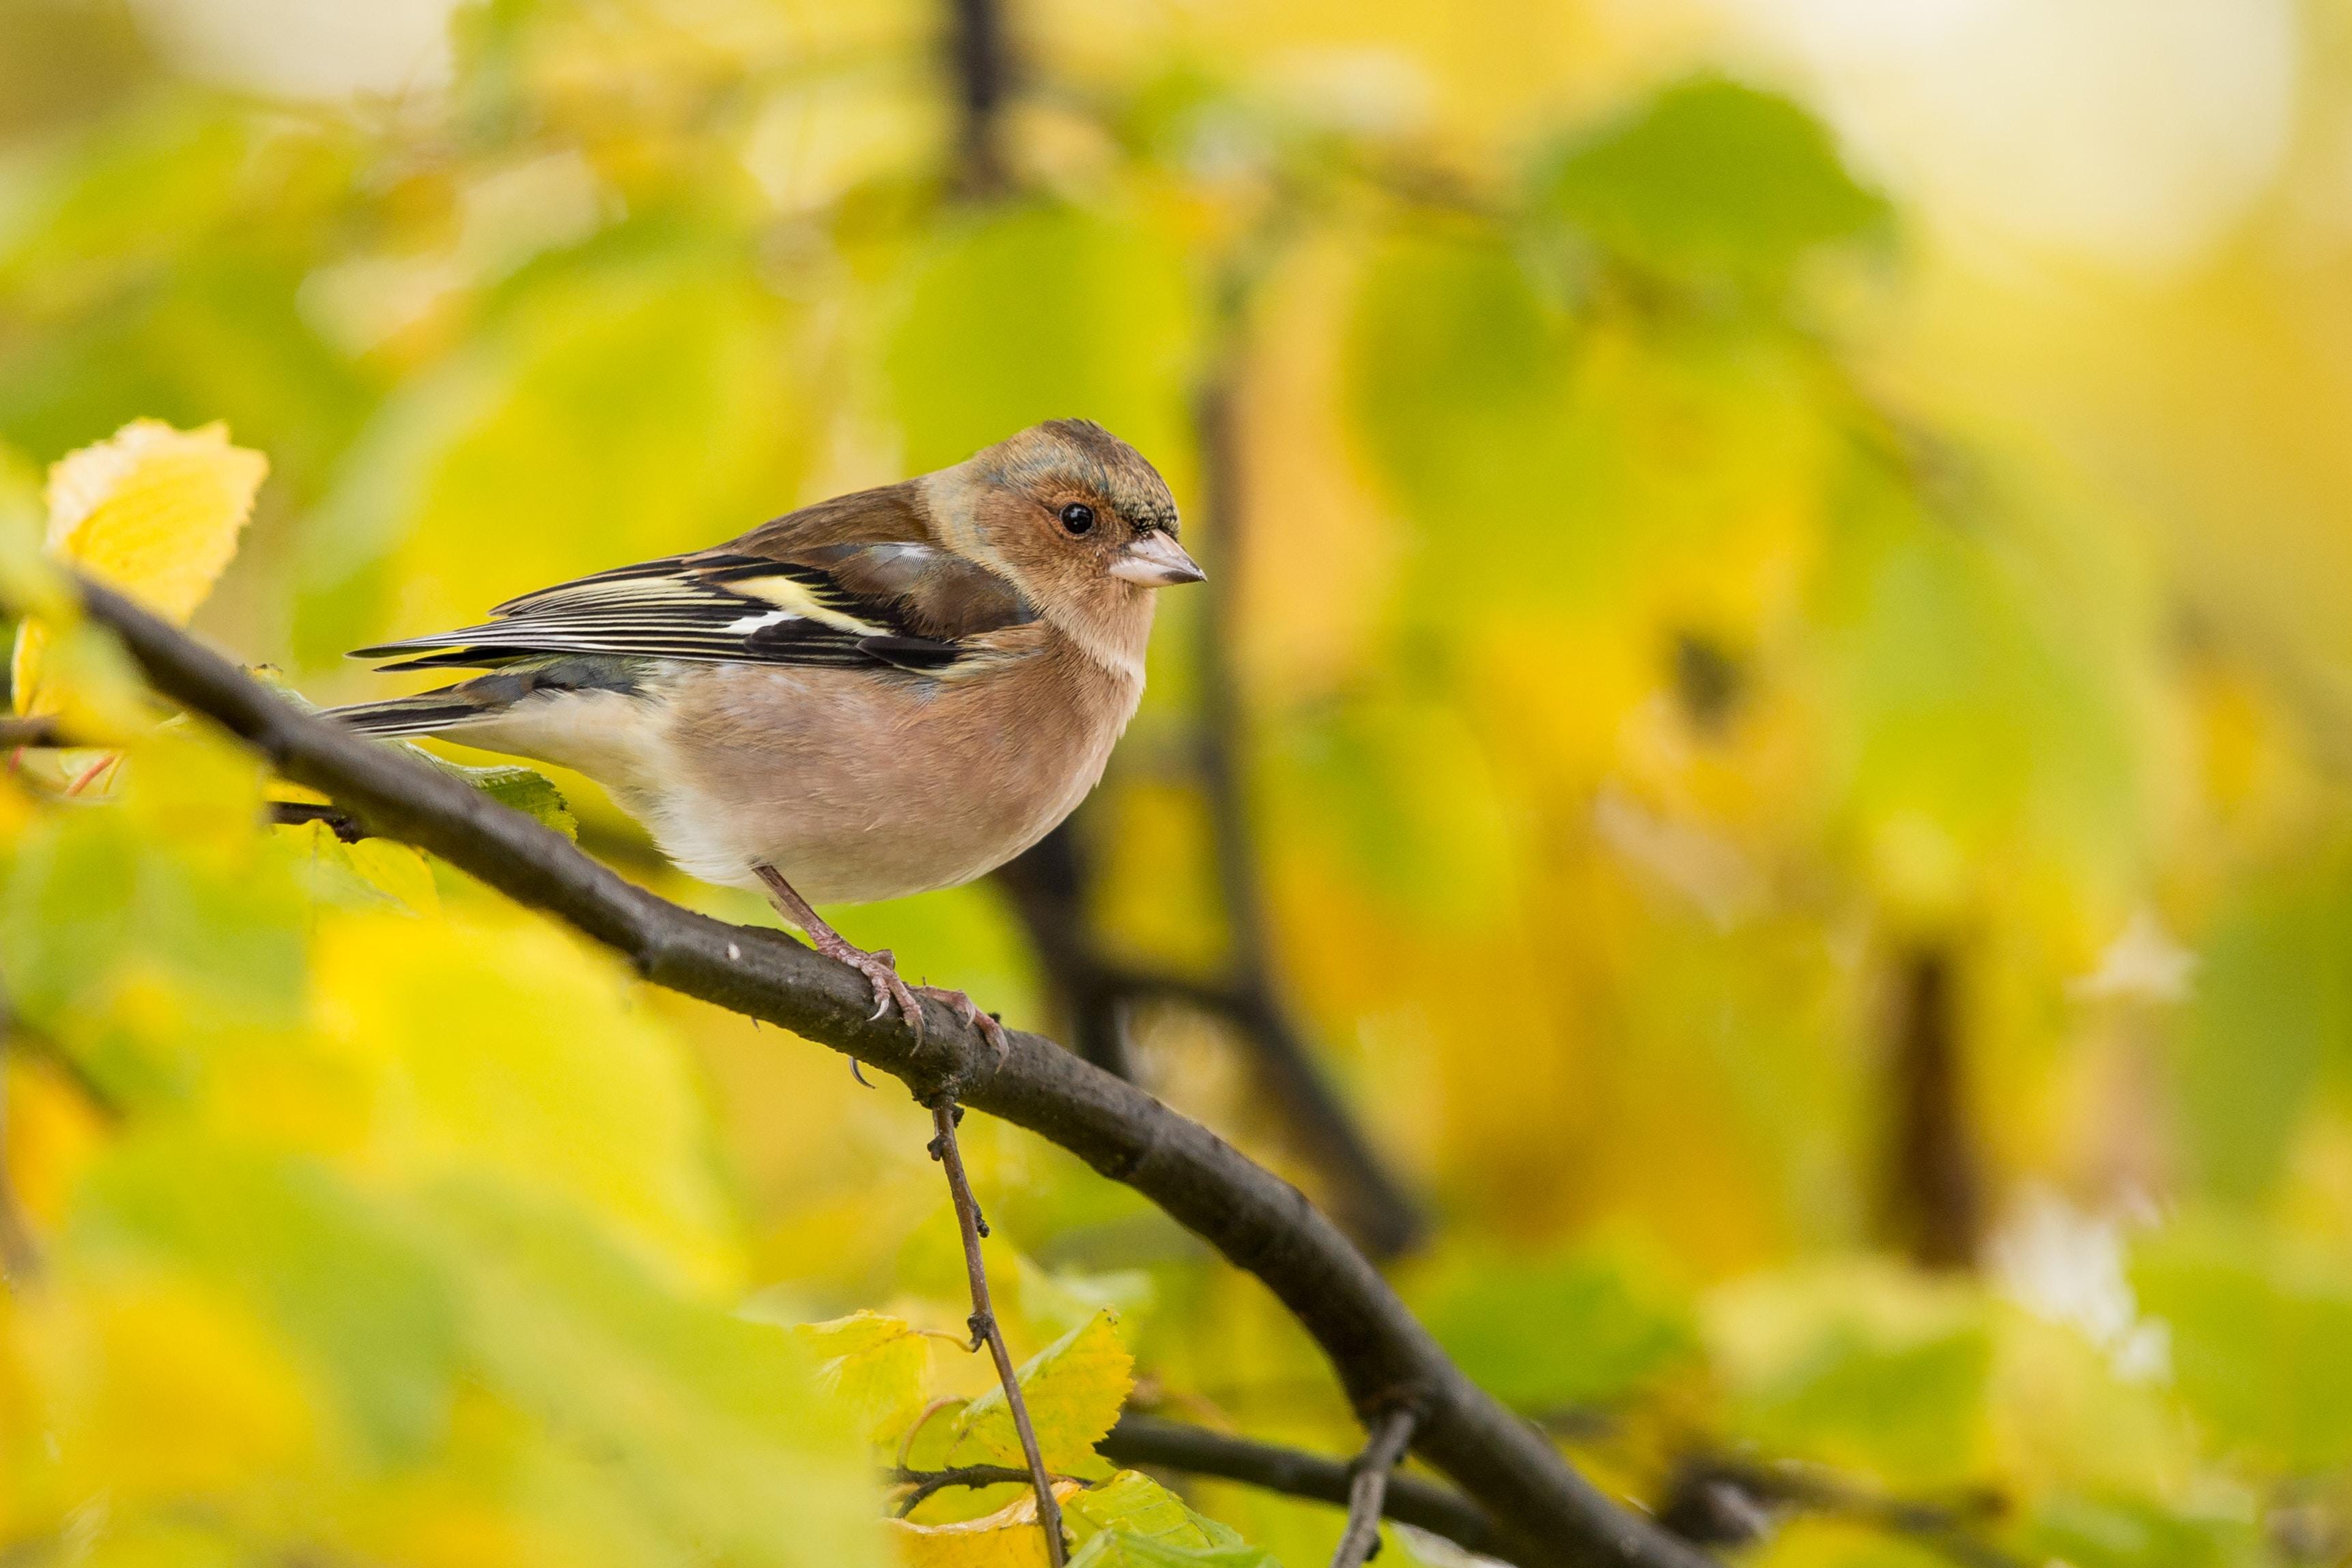 brown short-beaked bird on tree branch